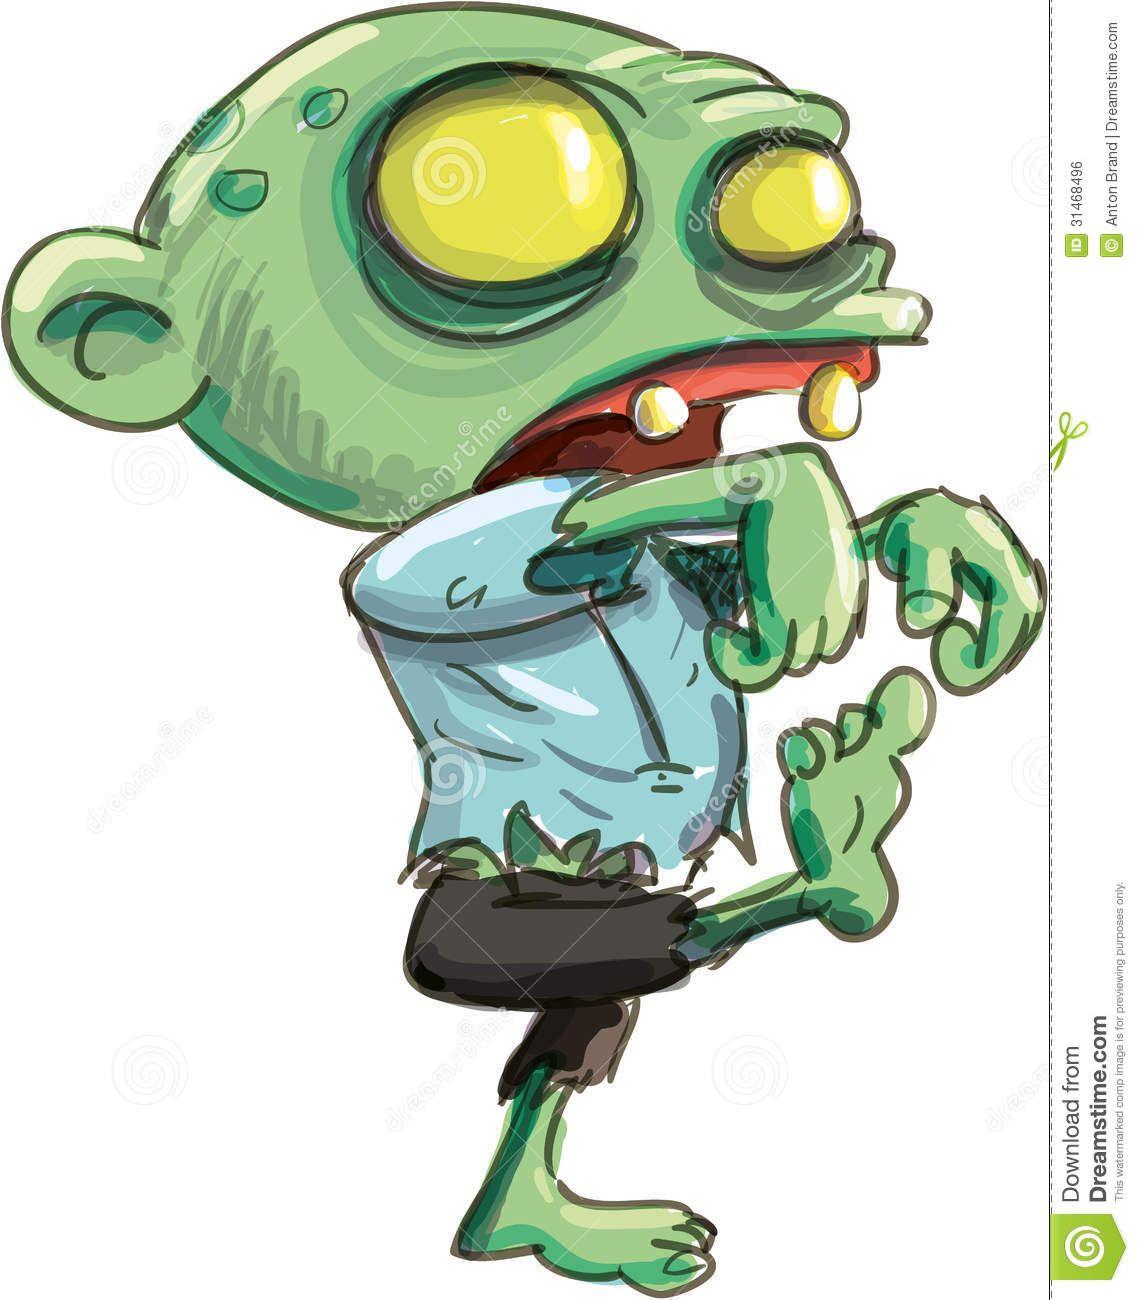 Cartoon Illustration Of Cute Green Zombie Zombie Illustration Cartoon Illustration Cartoon Character Design